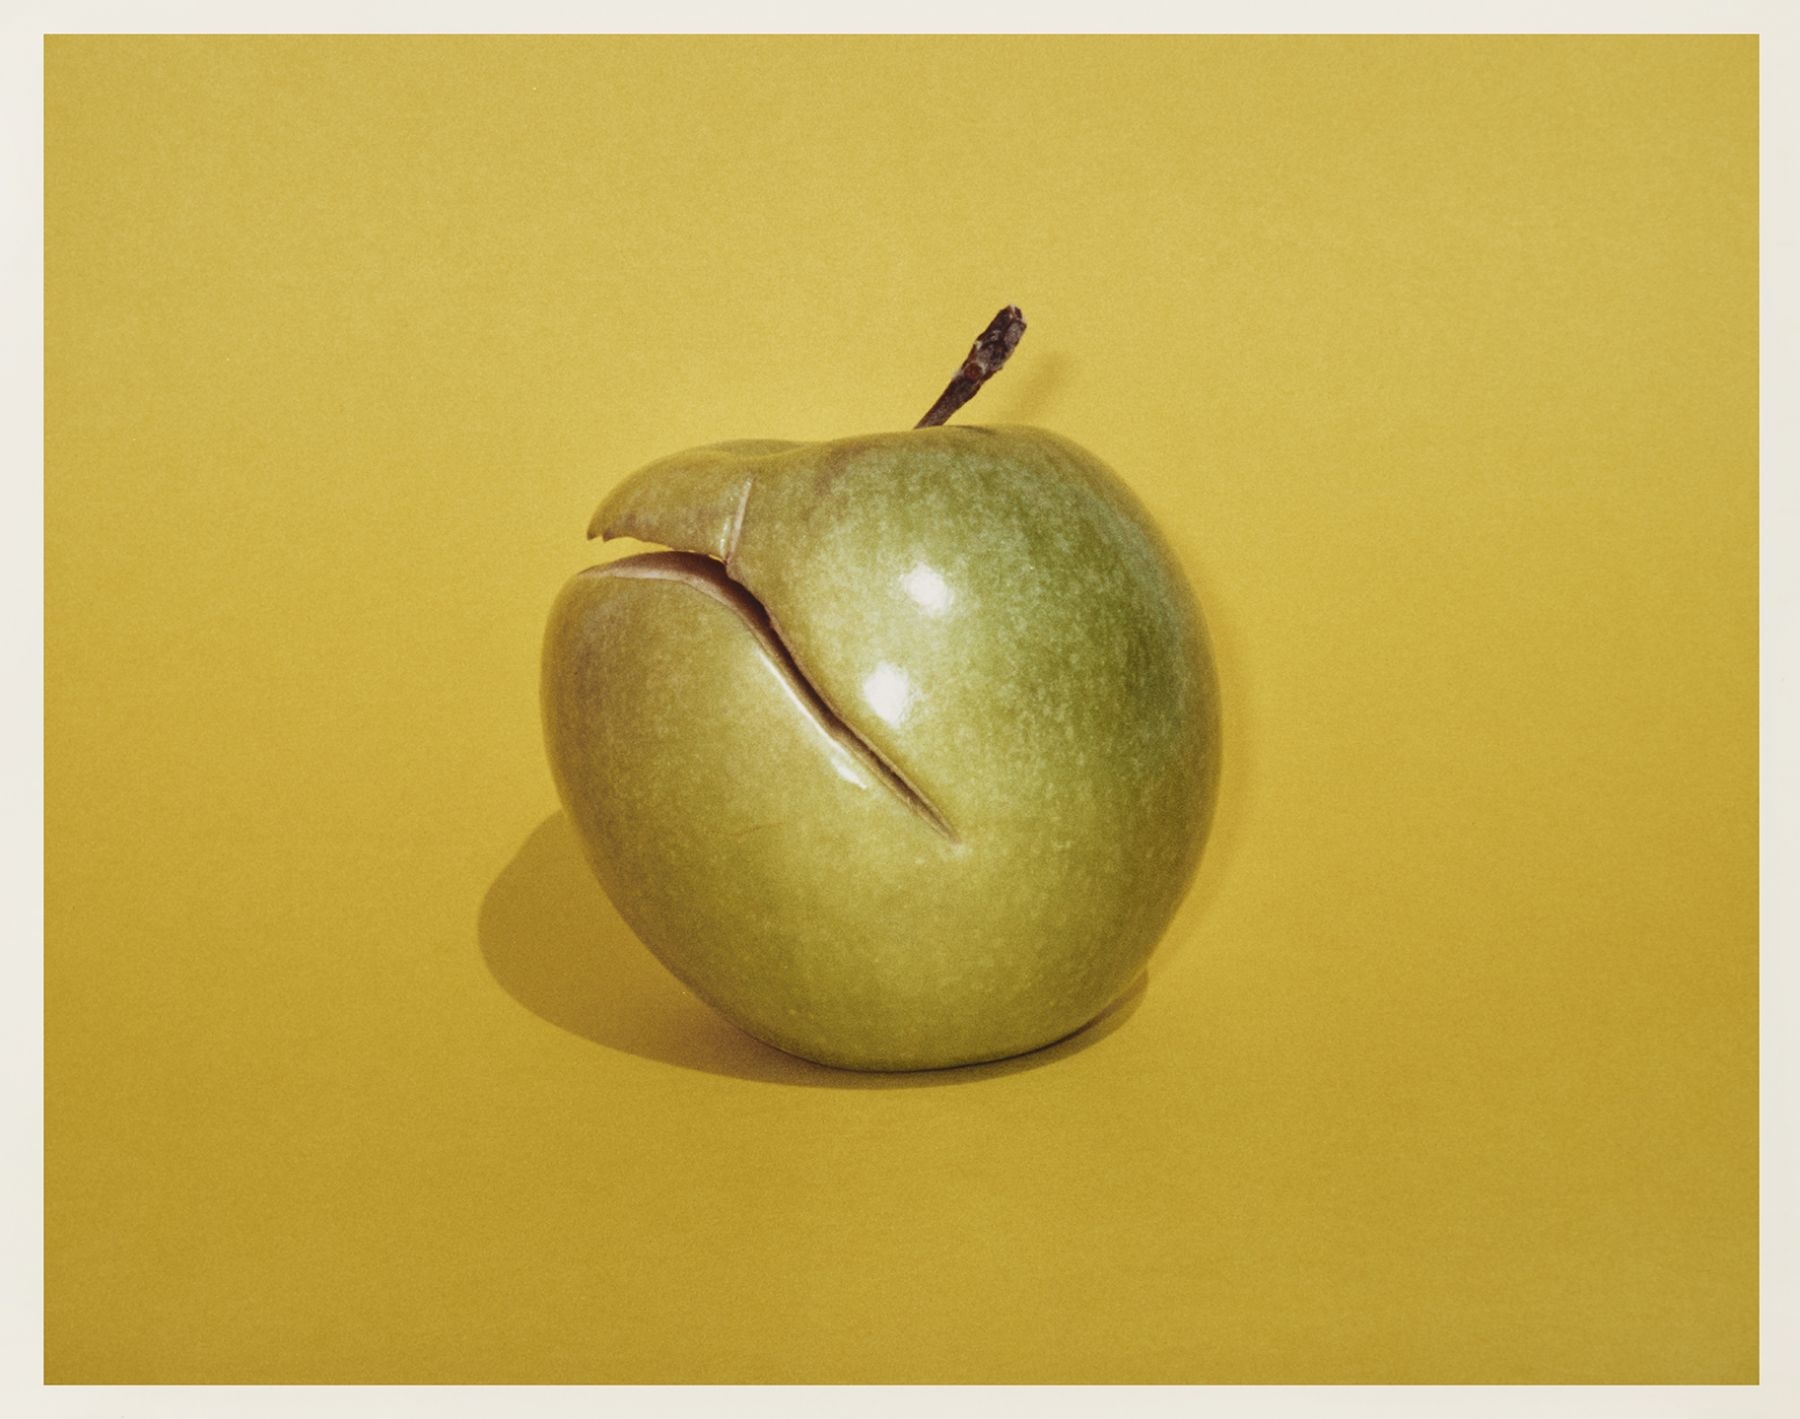 Figures, Yellow Apple, 2017, C-print, Ed. 10